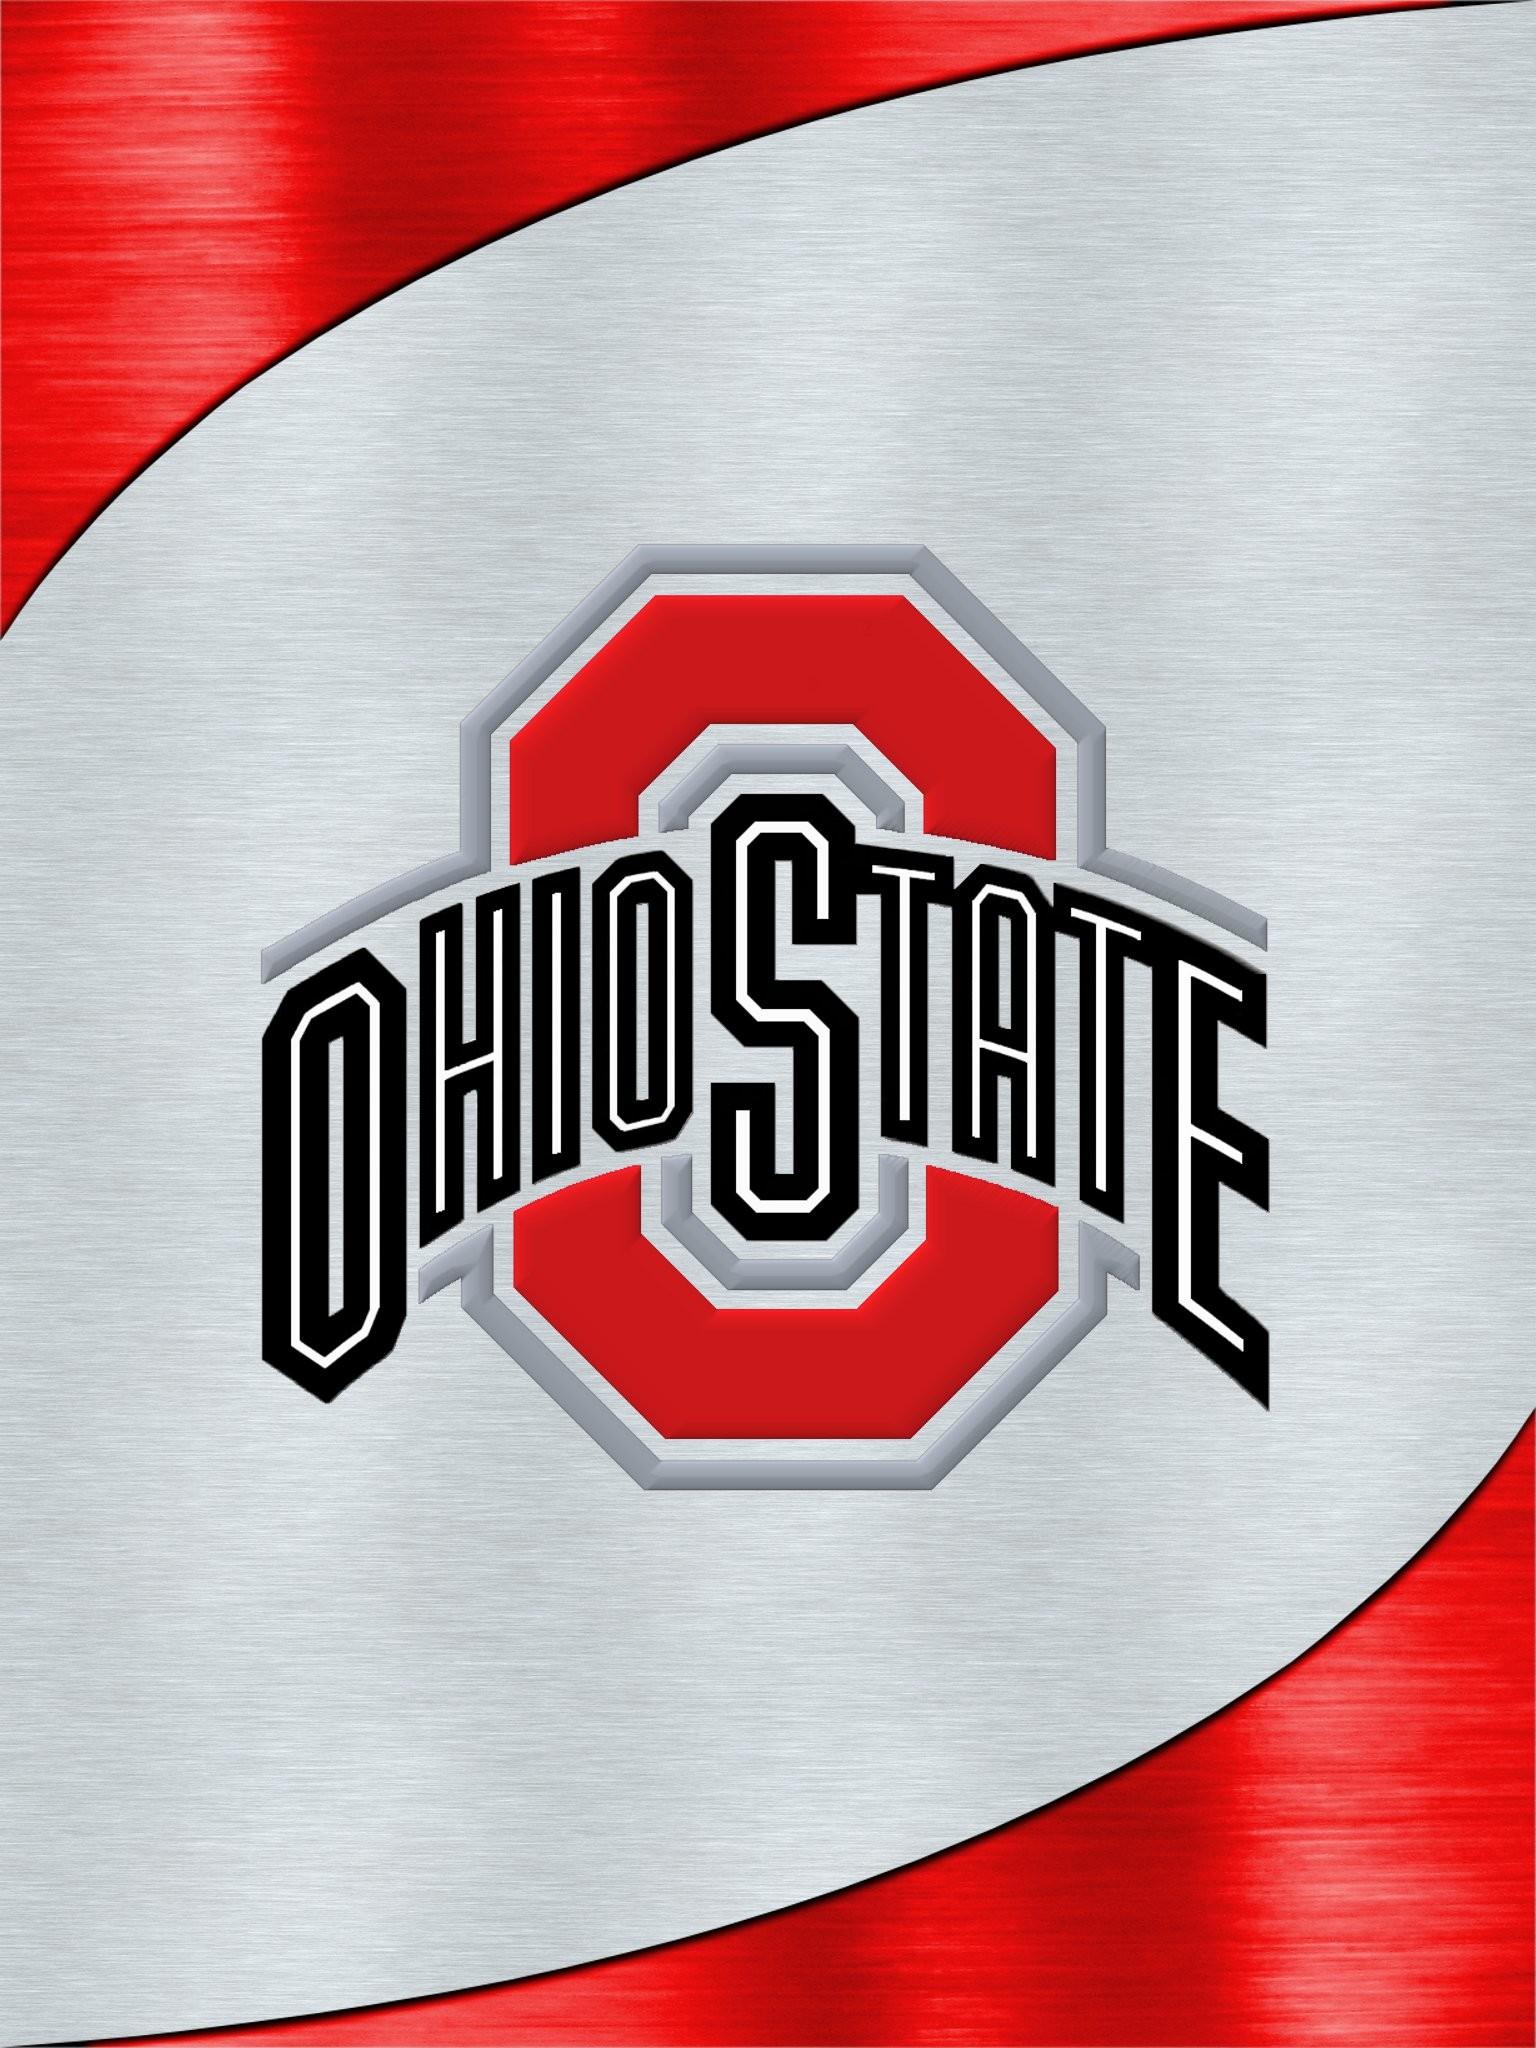 OSU ipad 2 Wallpaper 01 – ohio-state-football Fan Art